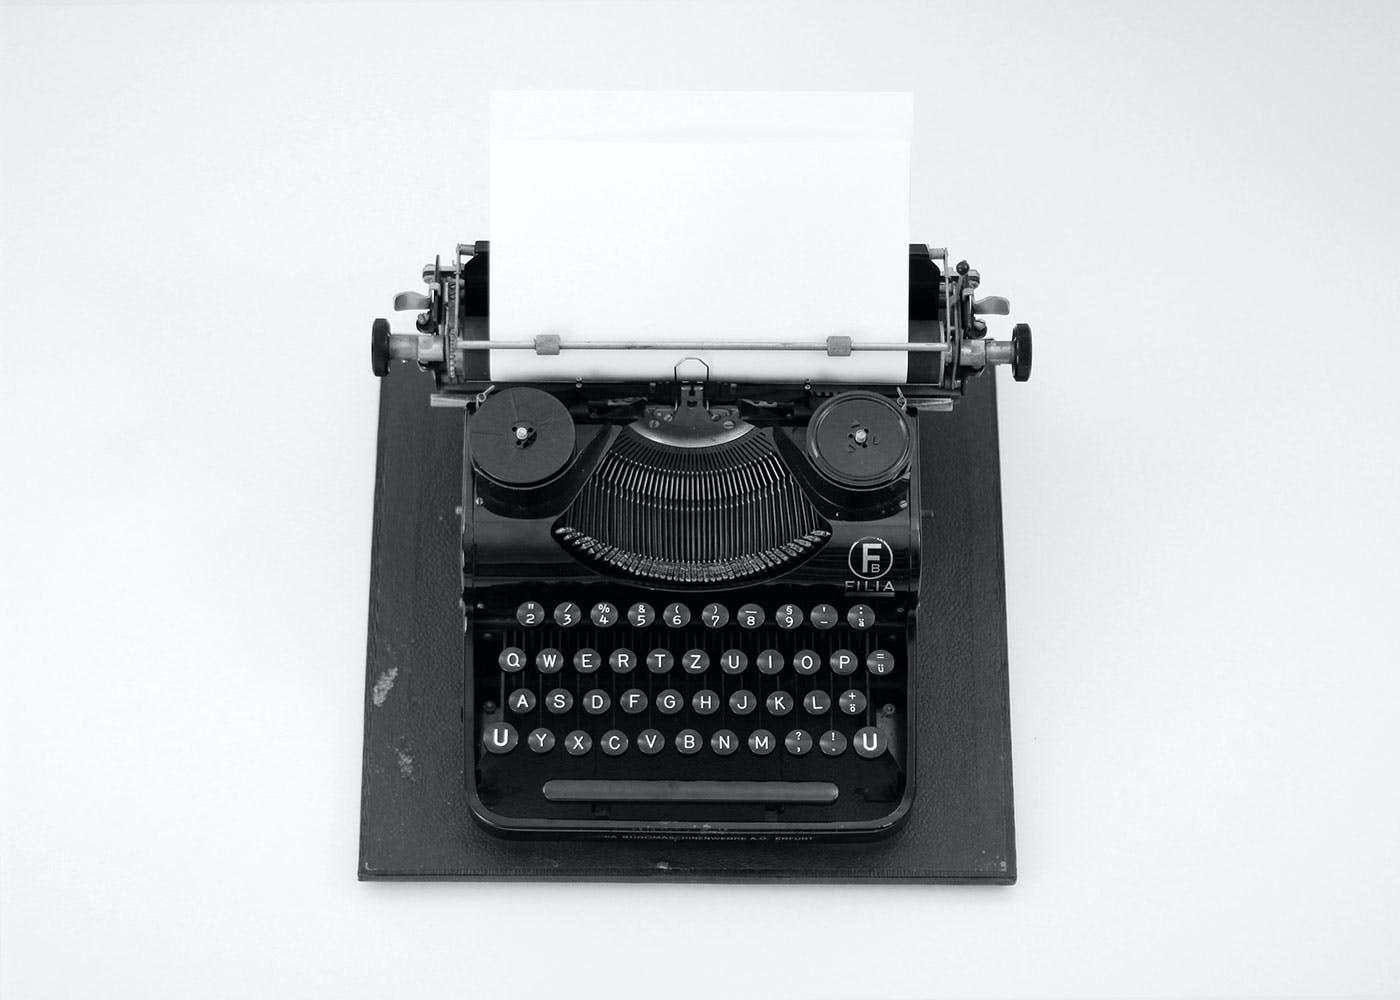 Old typewriter in black and white